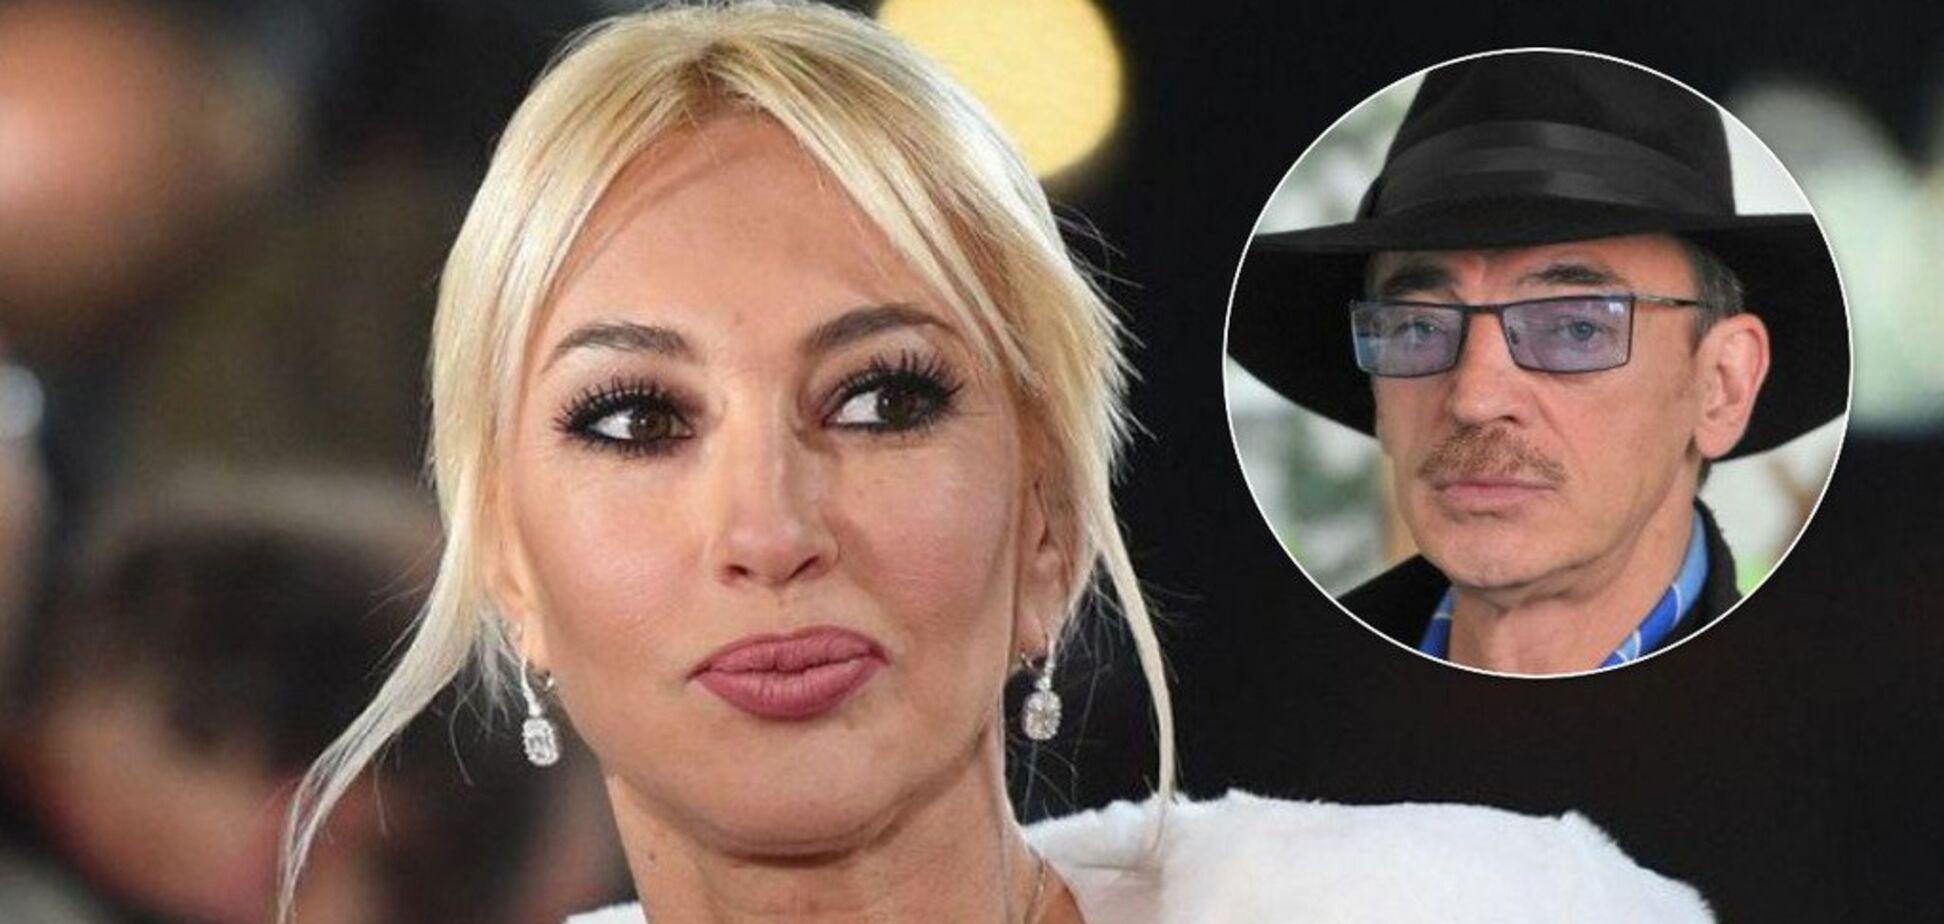 'Пошел на х*й': Кудрявцева атаковала Боярского из-за слов о материнстве